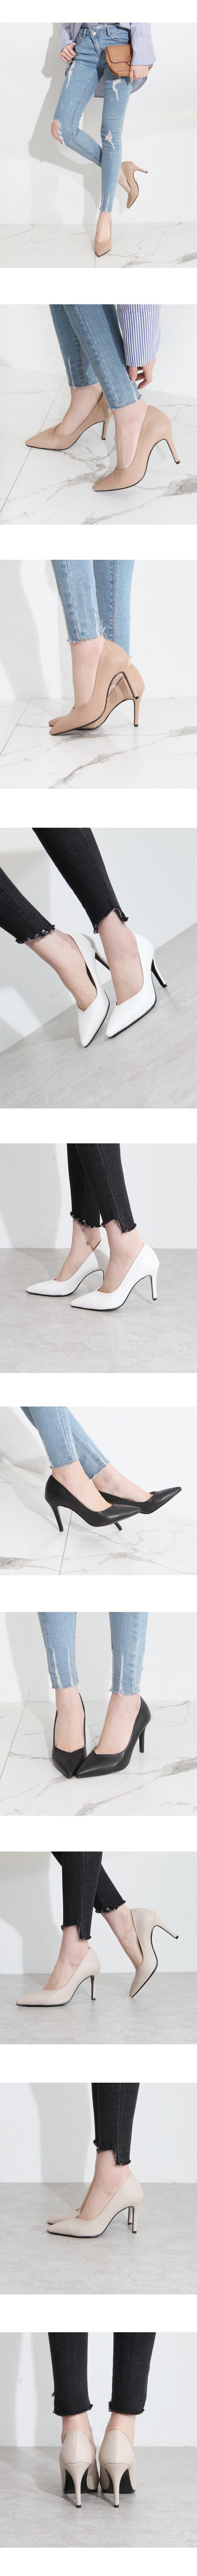 Slim Stiletto High Heels 9cm Black